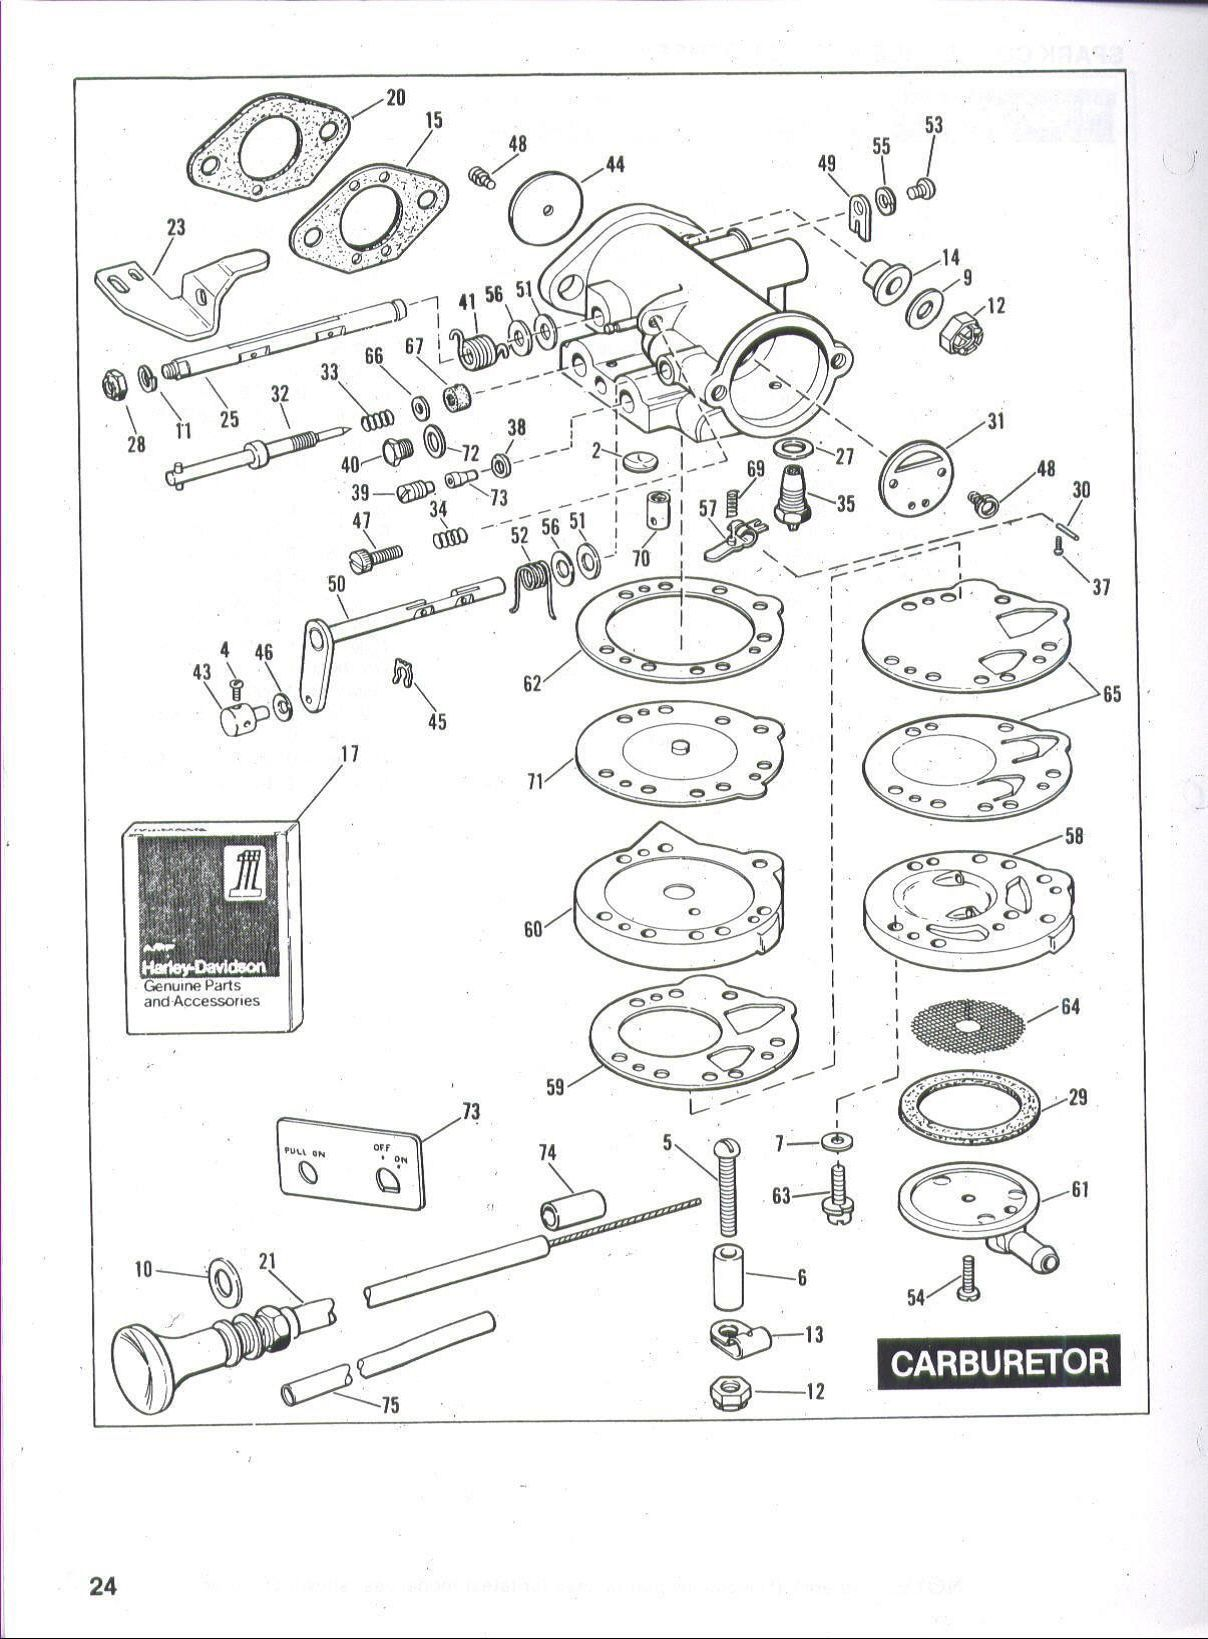 HarleyDavidson Golf Cart Carburetor Diagram | UTV stuff